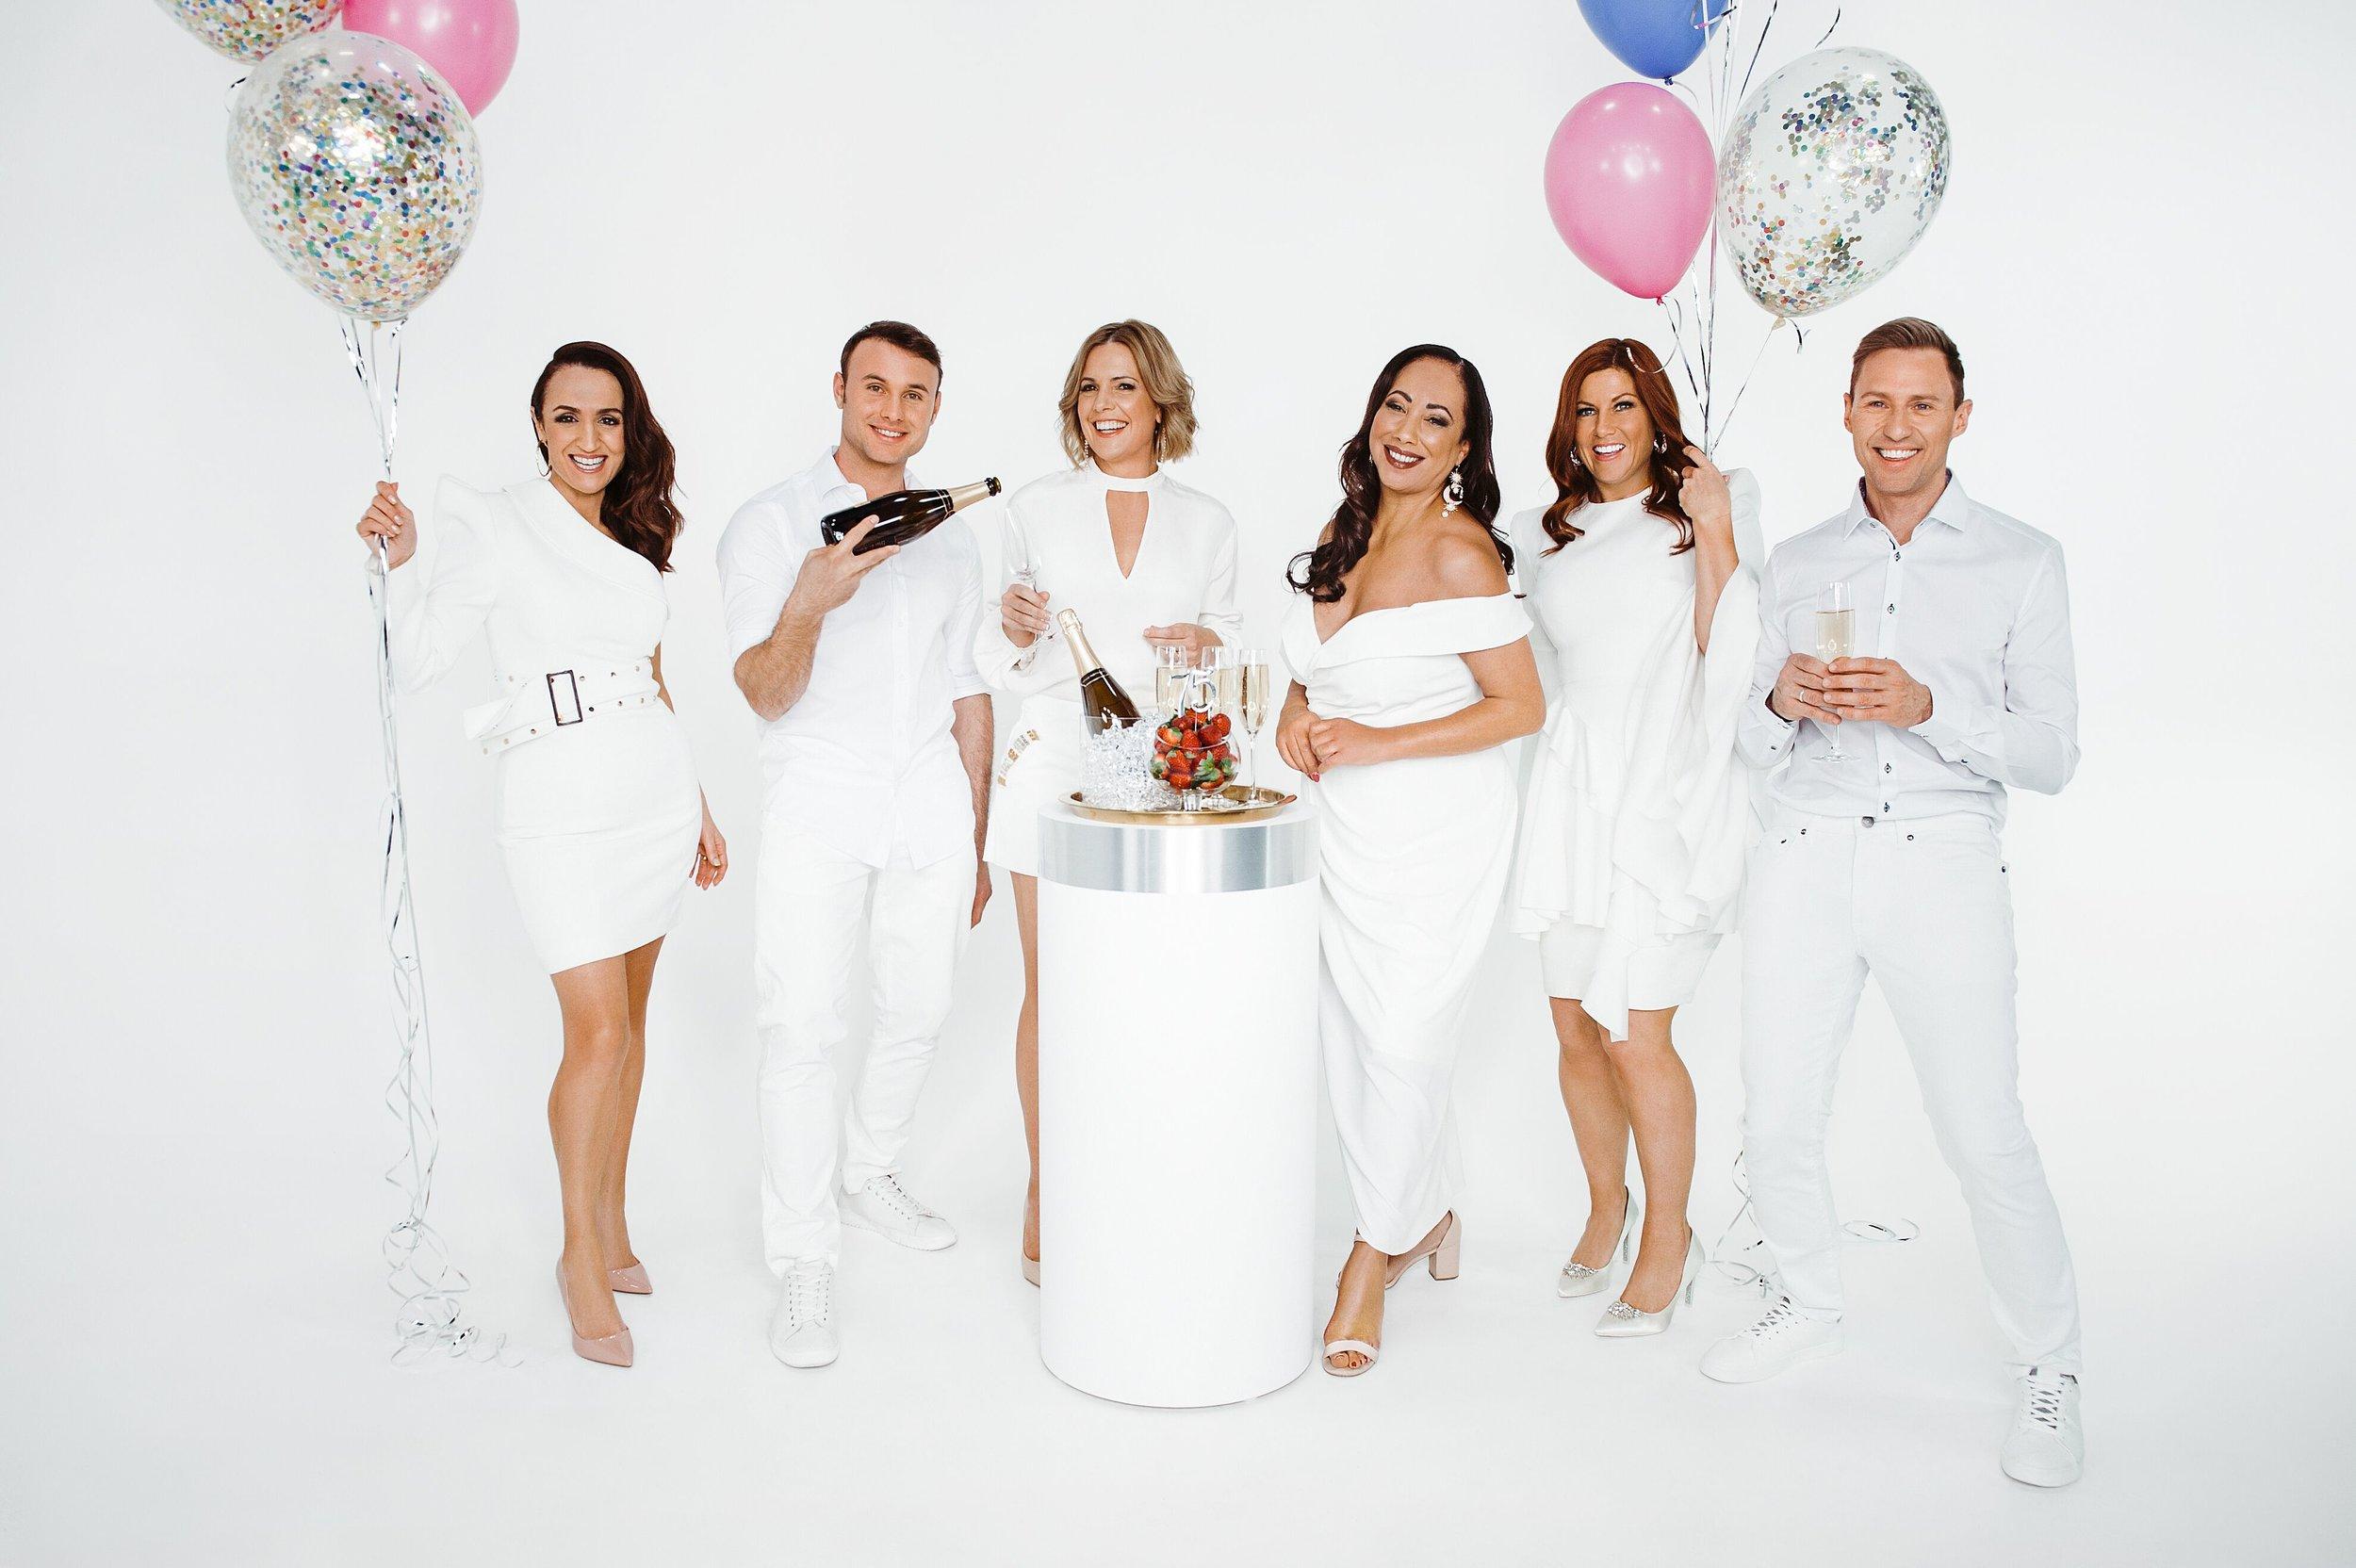 Justine Diana, Zac Deane, Carla King-Turner, Nikki Vincent, Gabby Berry  and  Steven Milne  image - openshop